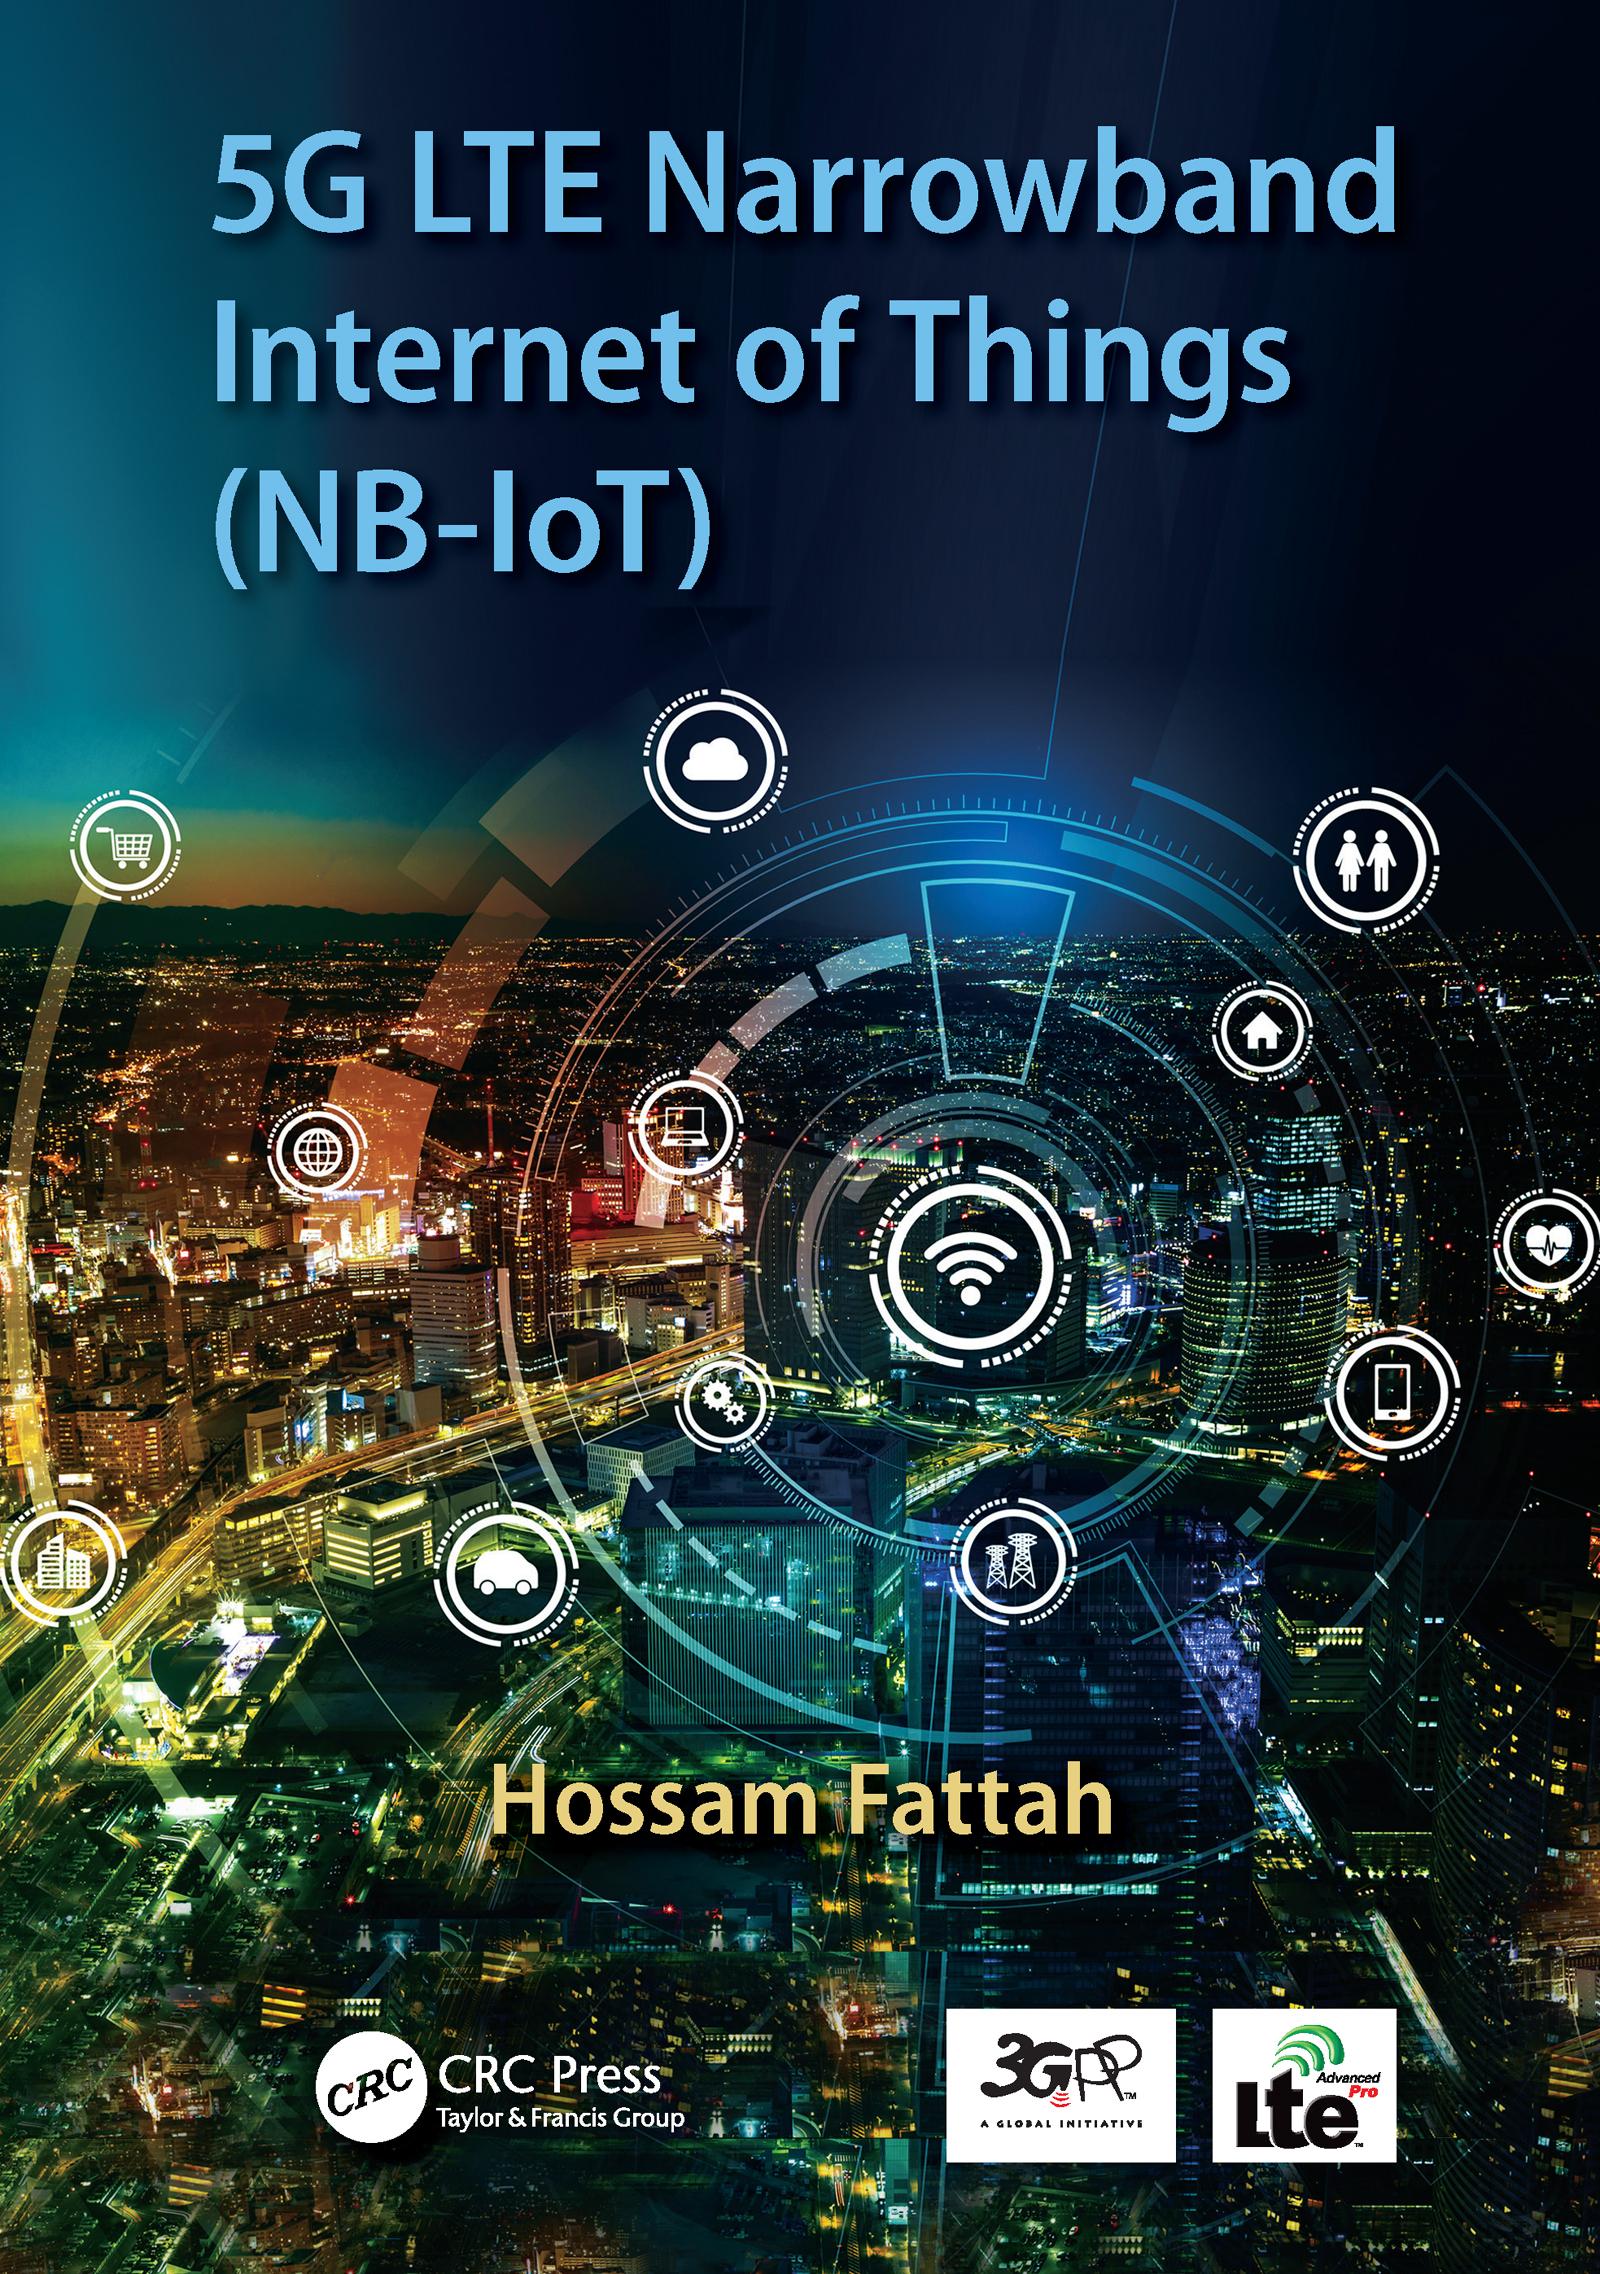 5G LTE Narrowband Internet of Things (NB-IoT)